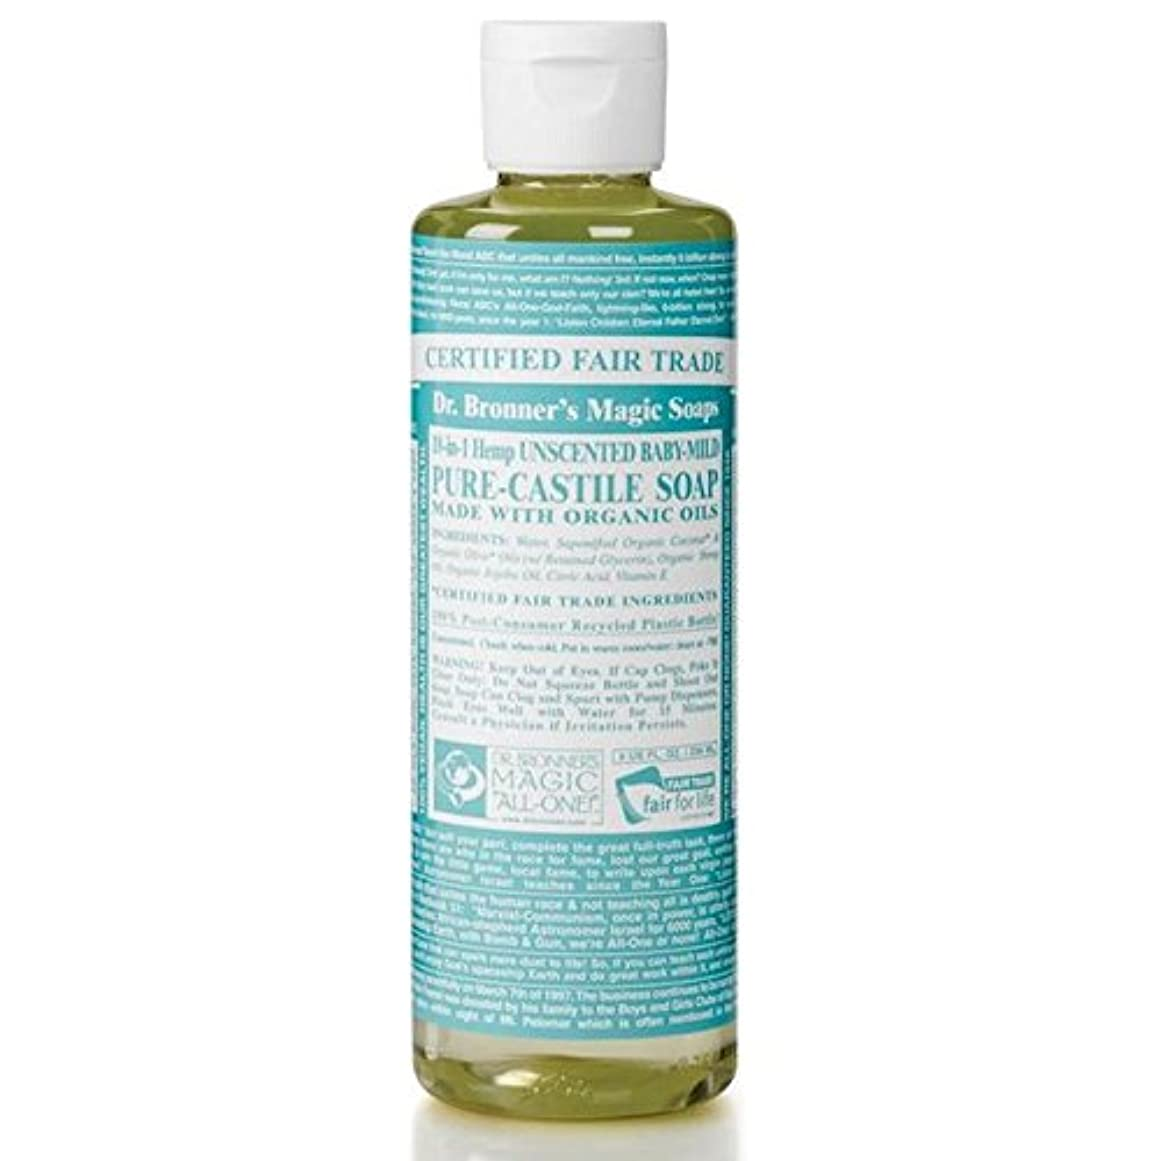 Dr Bronner Organic Baby Mild Cast Liquid Soap 237ml - のブロナーオーガニックベビーマイルドなキャスト液体石鹸237ミリリットル [並行輸入品]